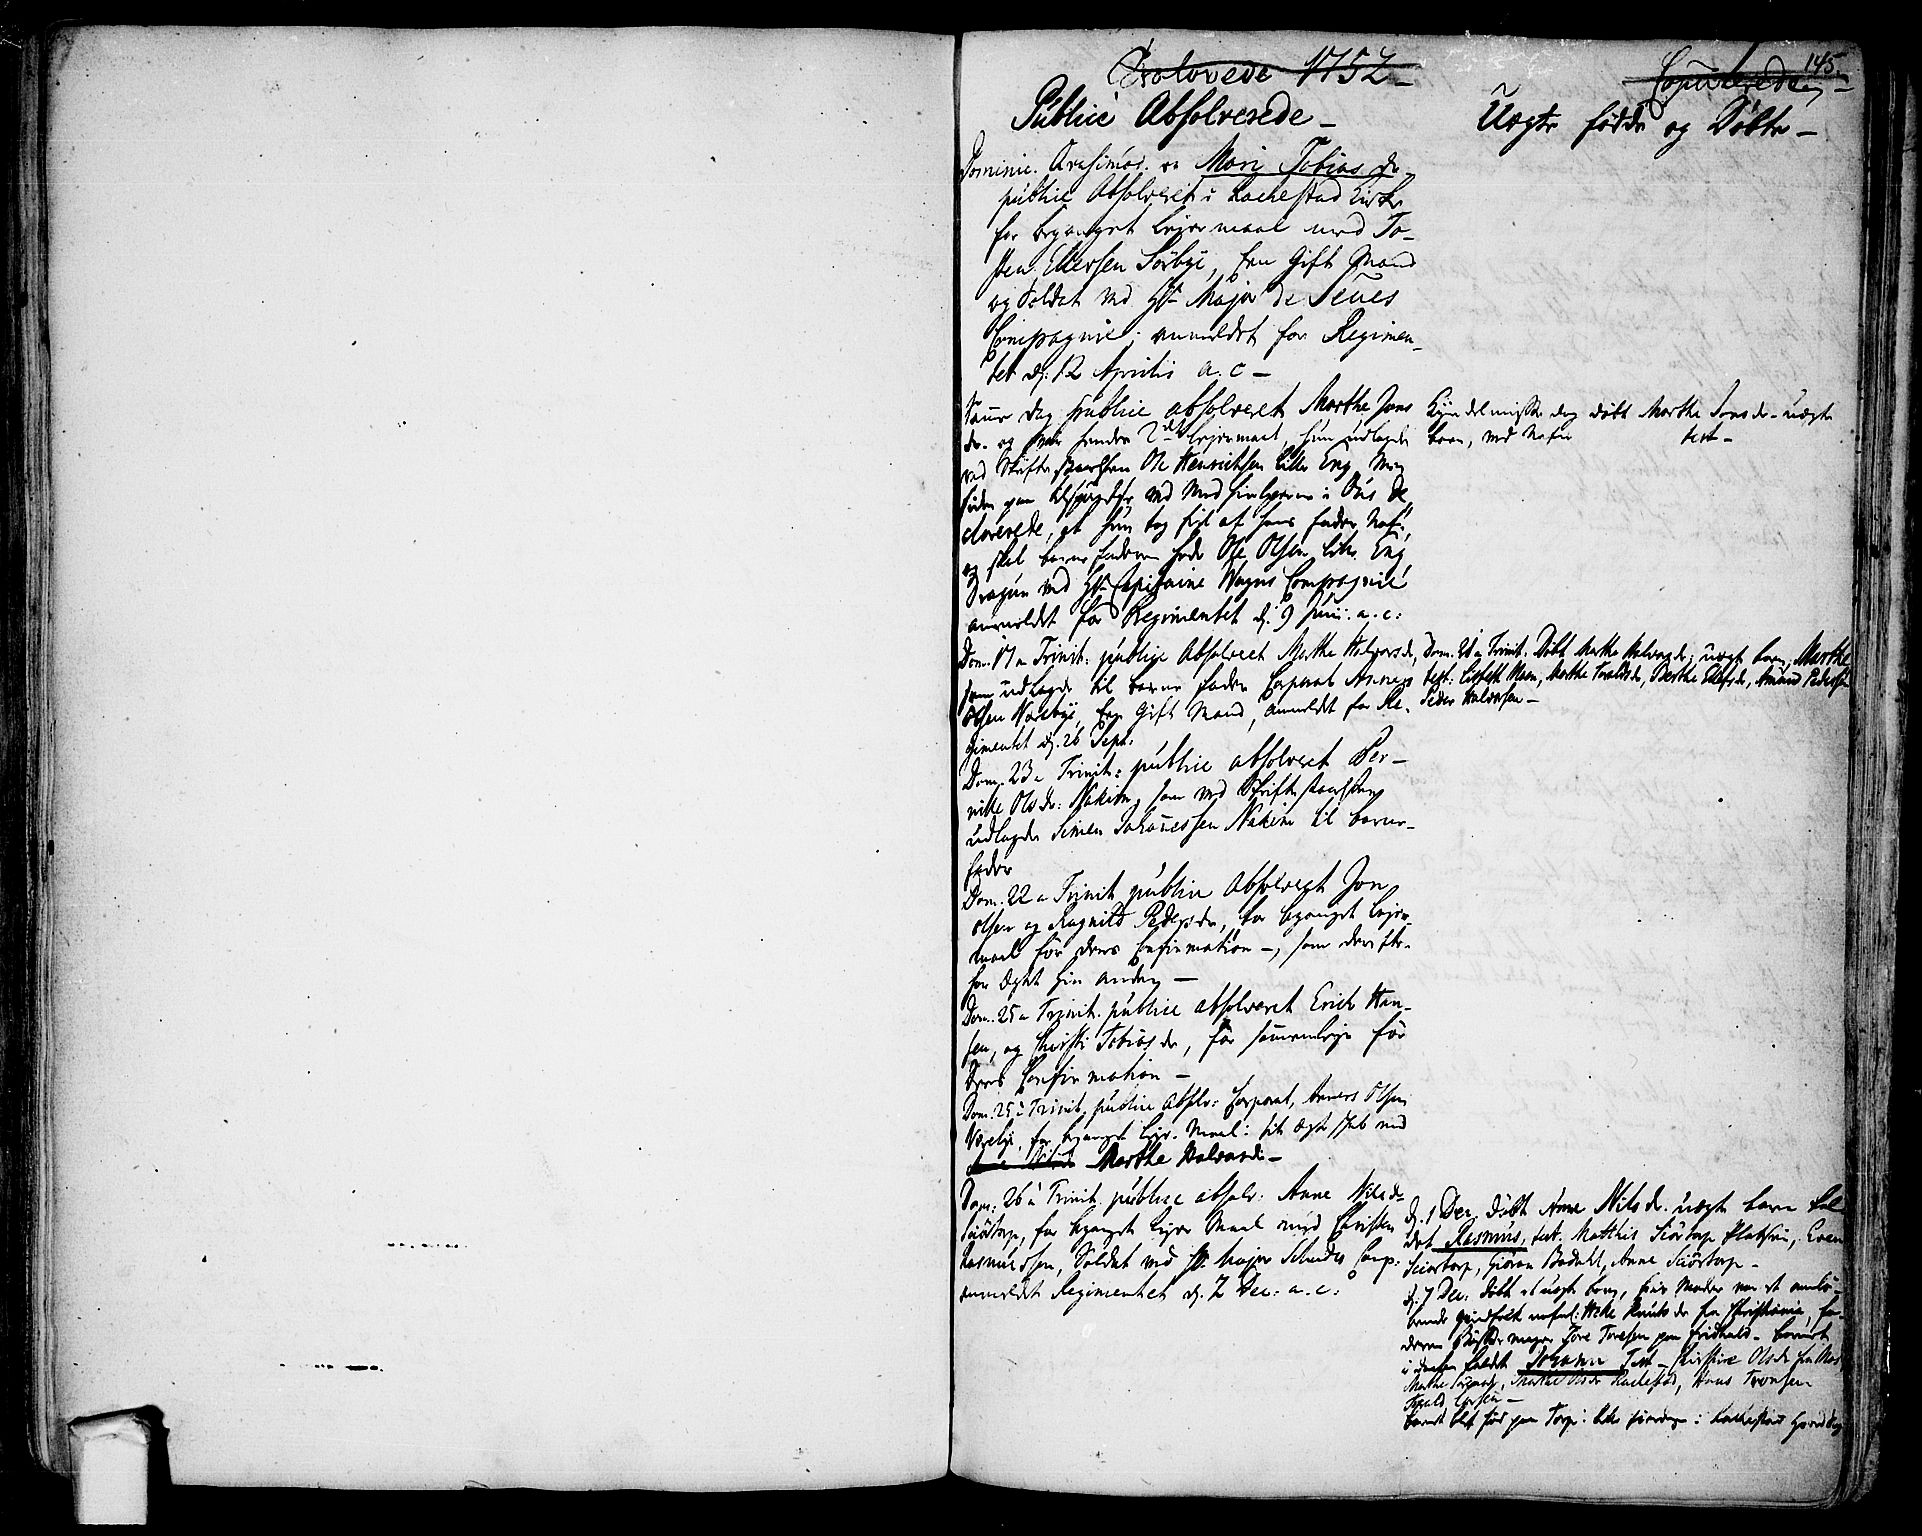 SAO, Rakkestad prestekontor Kirkebøker, F/Fa/L0003: Parish register (official) no. I 3, 1752-1777, p. 145